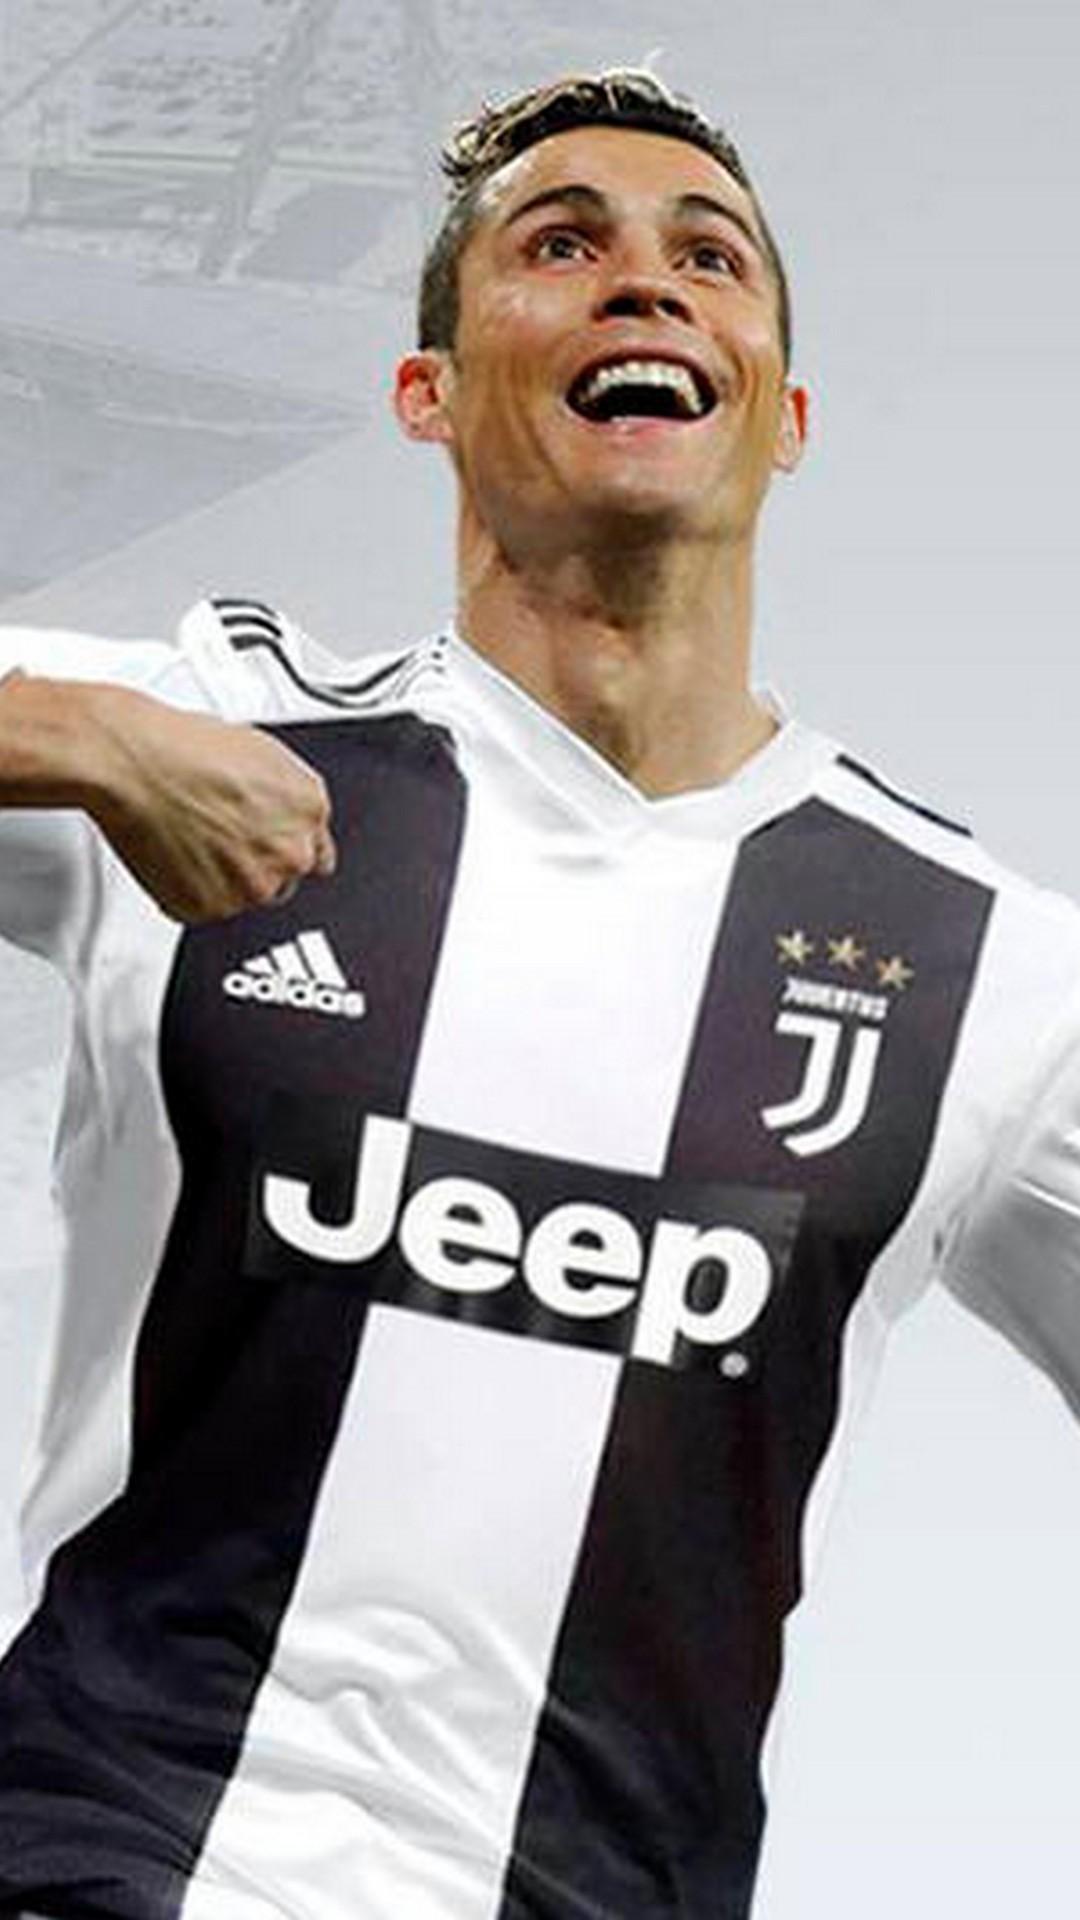 51 Cristiano Ronaldo 2020 Mobile Wallpapers On Wallpapersafari